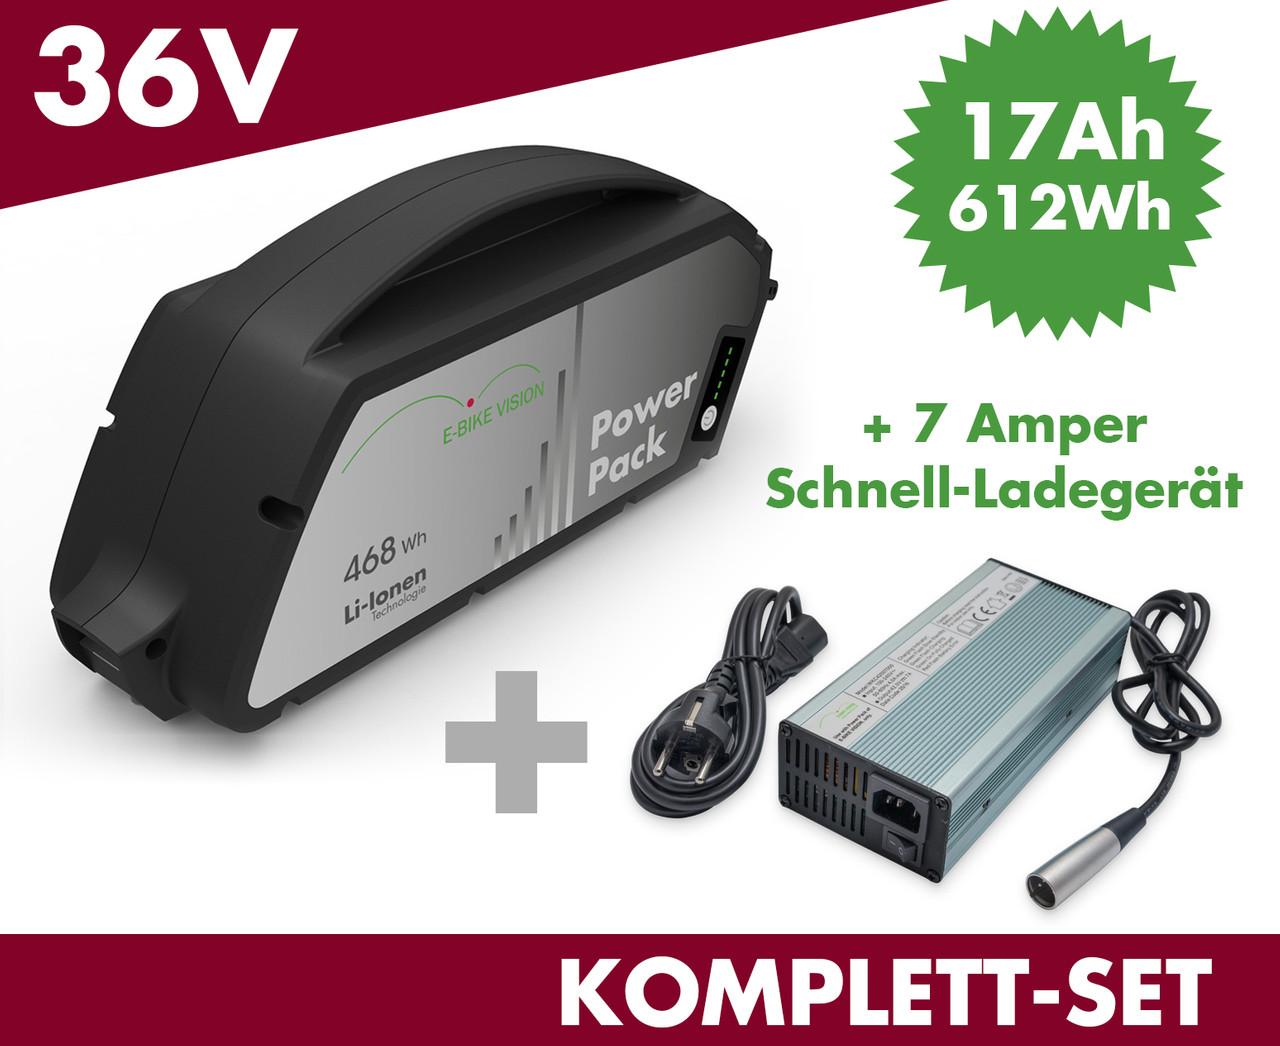 SET E-Bike Ersatzakku Power Pack 17 Ah 612 Wh 36V für Bosch Classic Unterrohr + Ladegerät – Bild 1